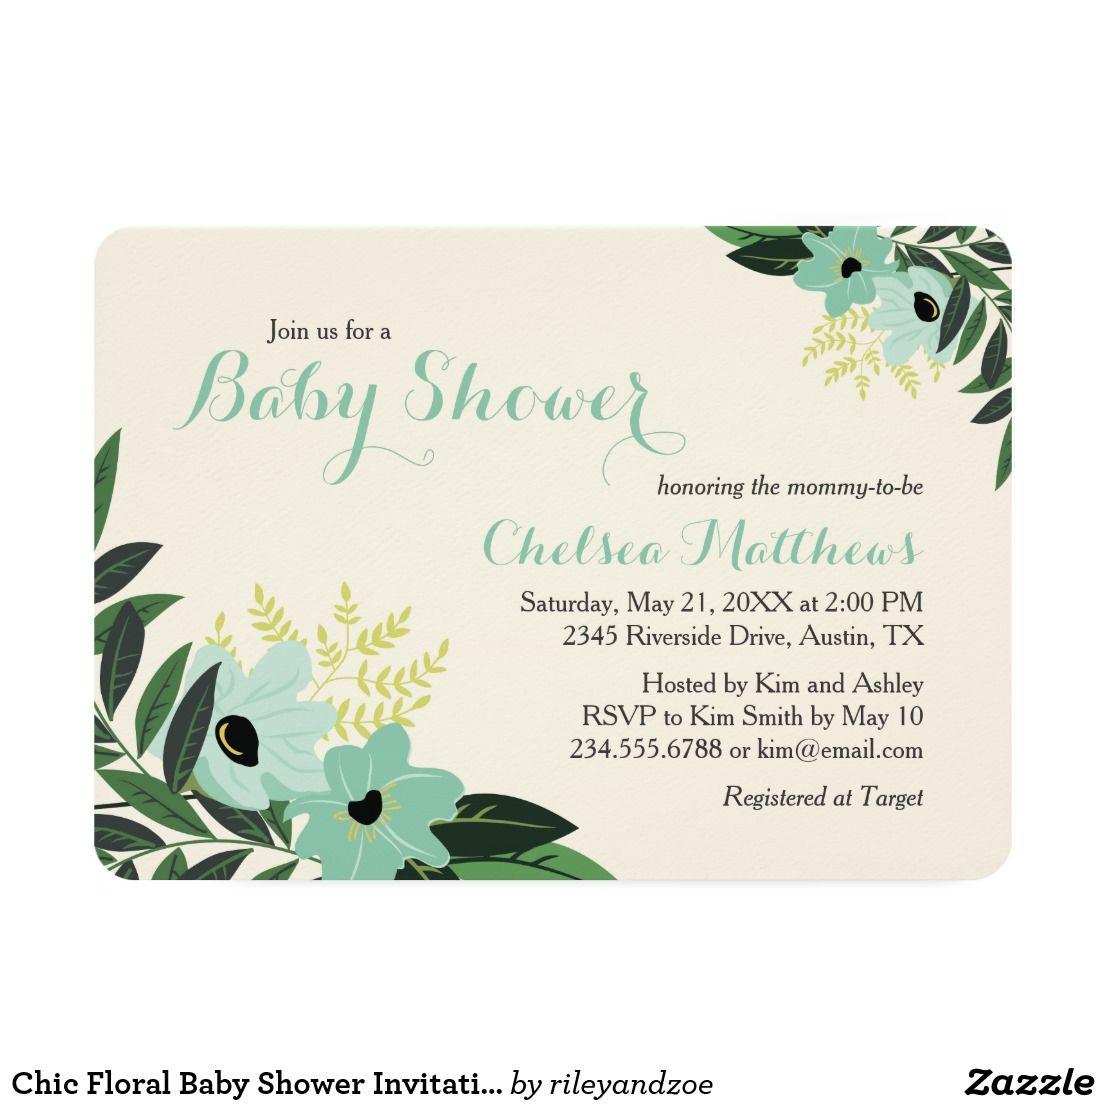 Chic Floral Baby Shower Invitation Chic modern elegant baby shower ...